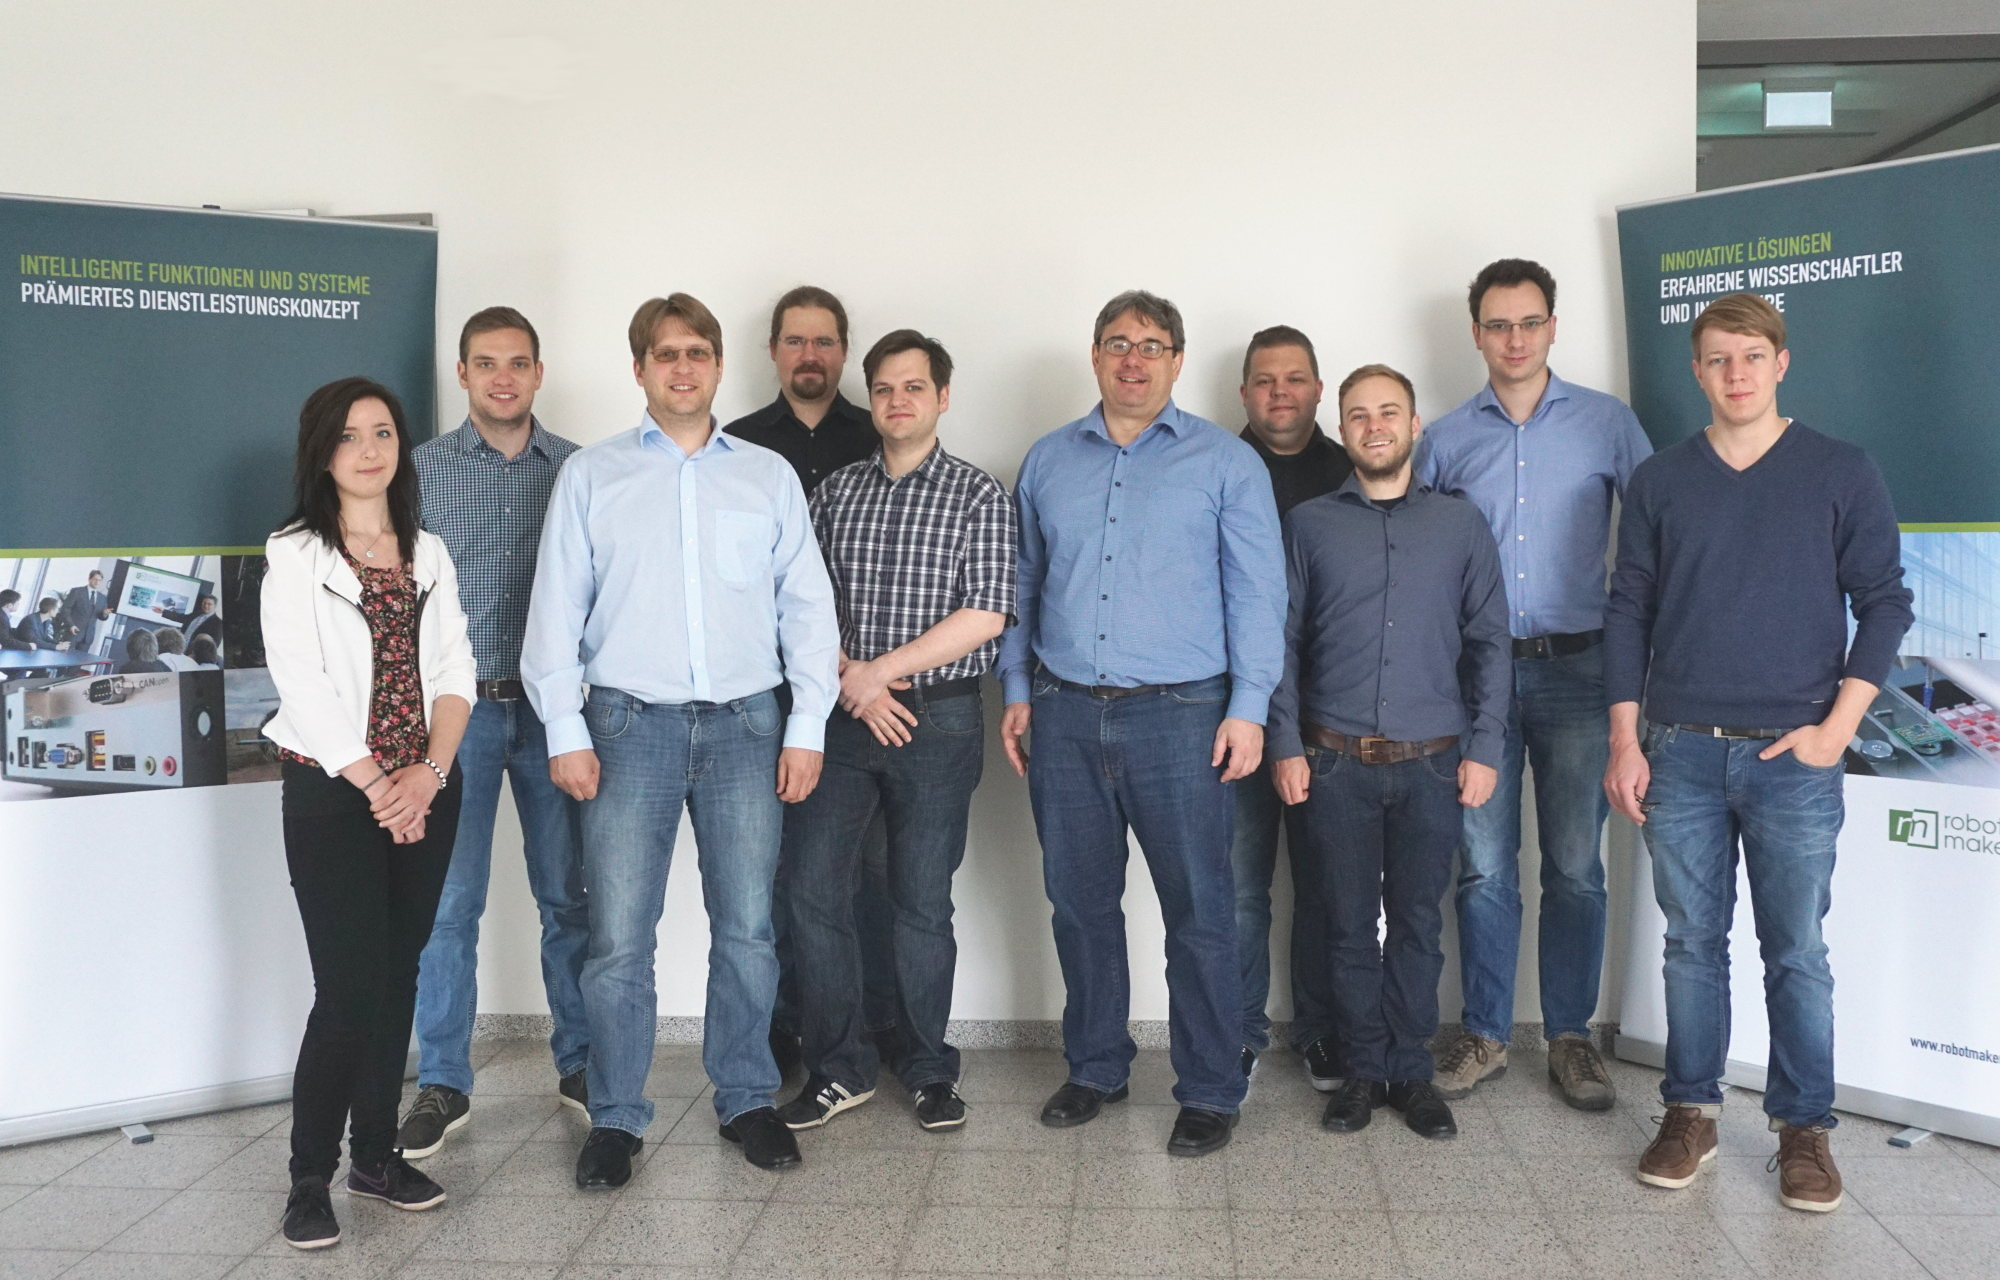 Robot Makers GmbH celebrates its 5th anniversary